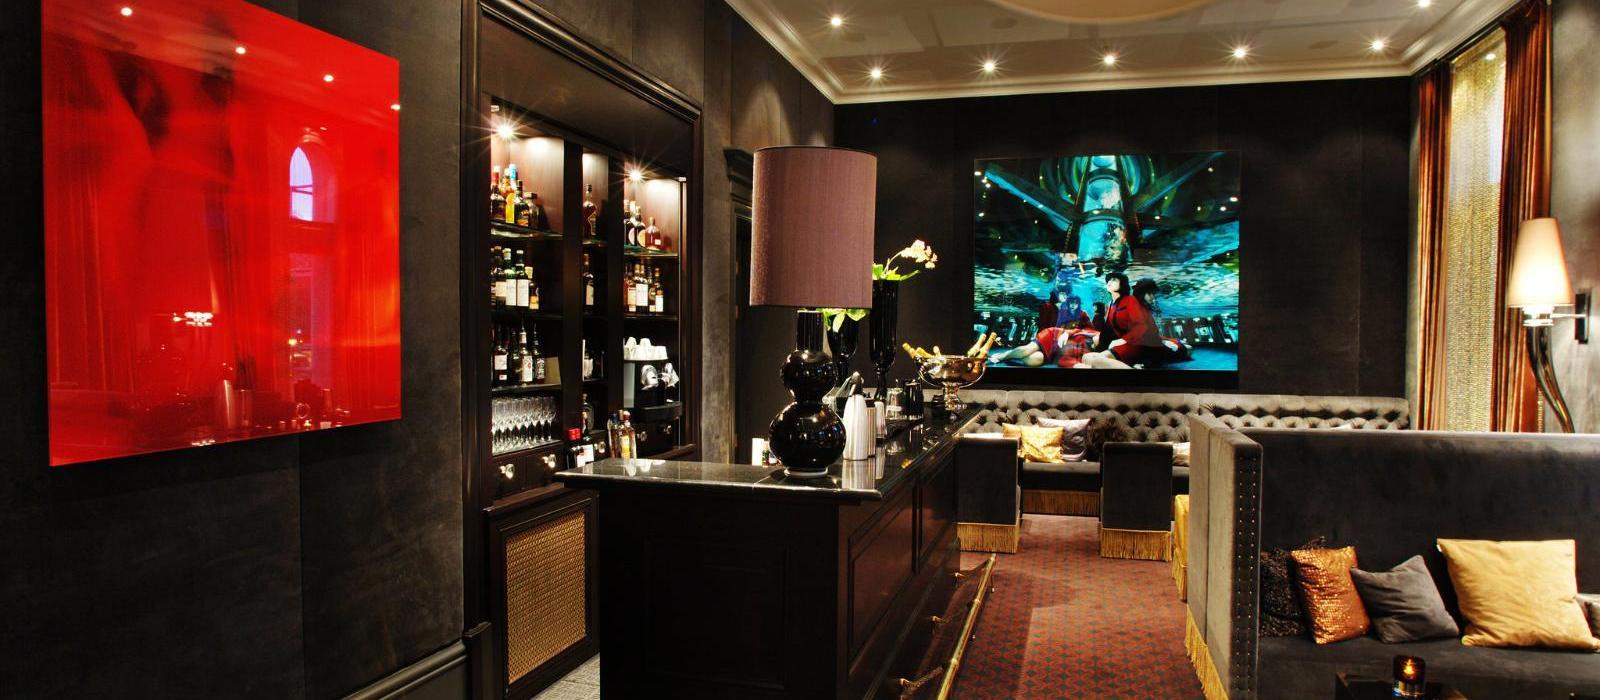 大陆酒店(Hotel Continental) 酒廊图片  www.lhw.cn